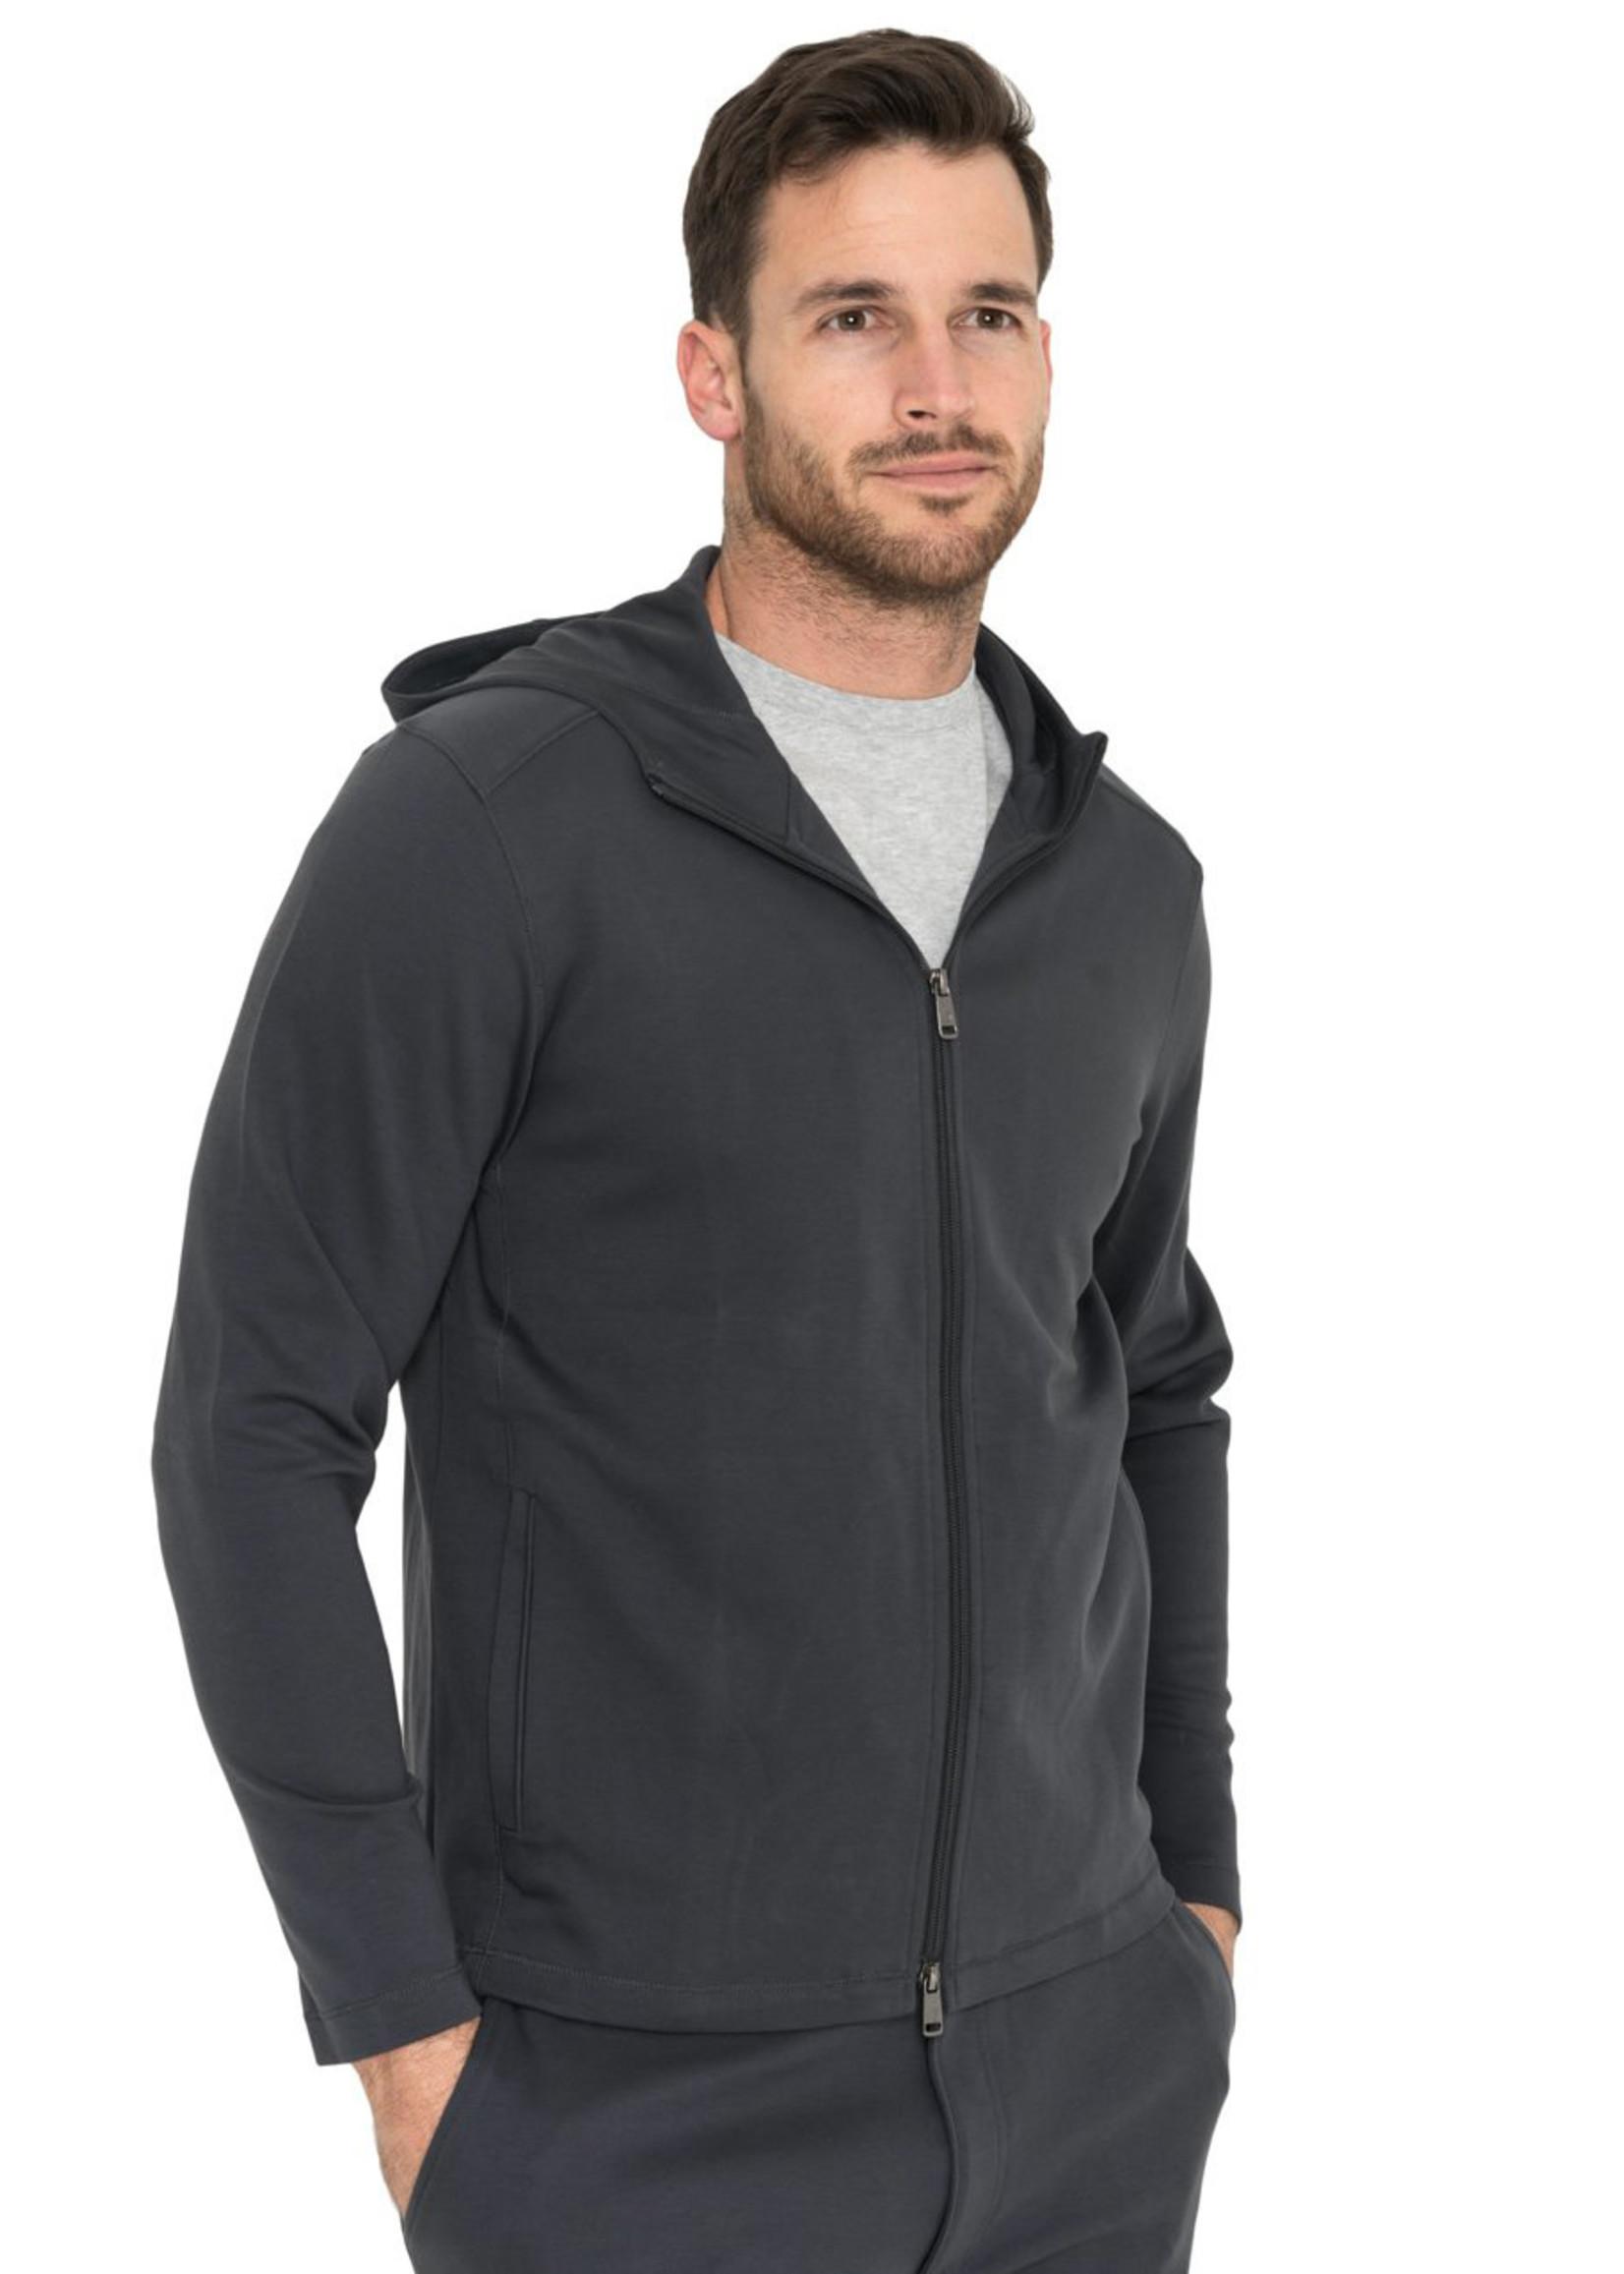 Raffi Zip Hoodie Jacket Charcoal Aqua Cotton by Raffi